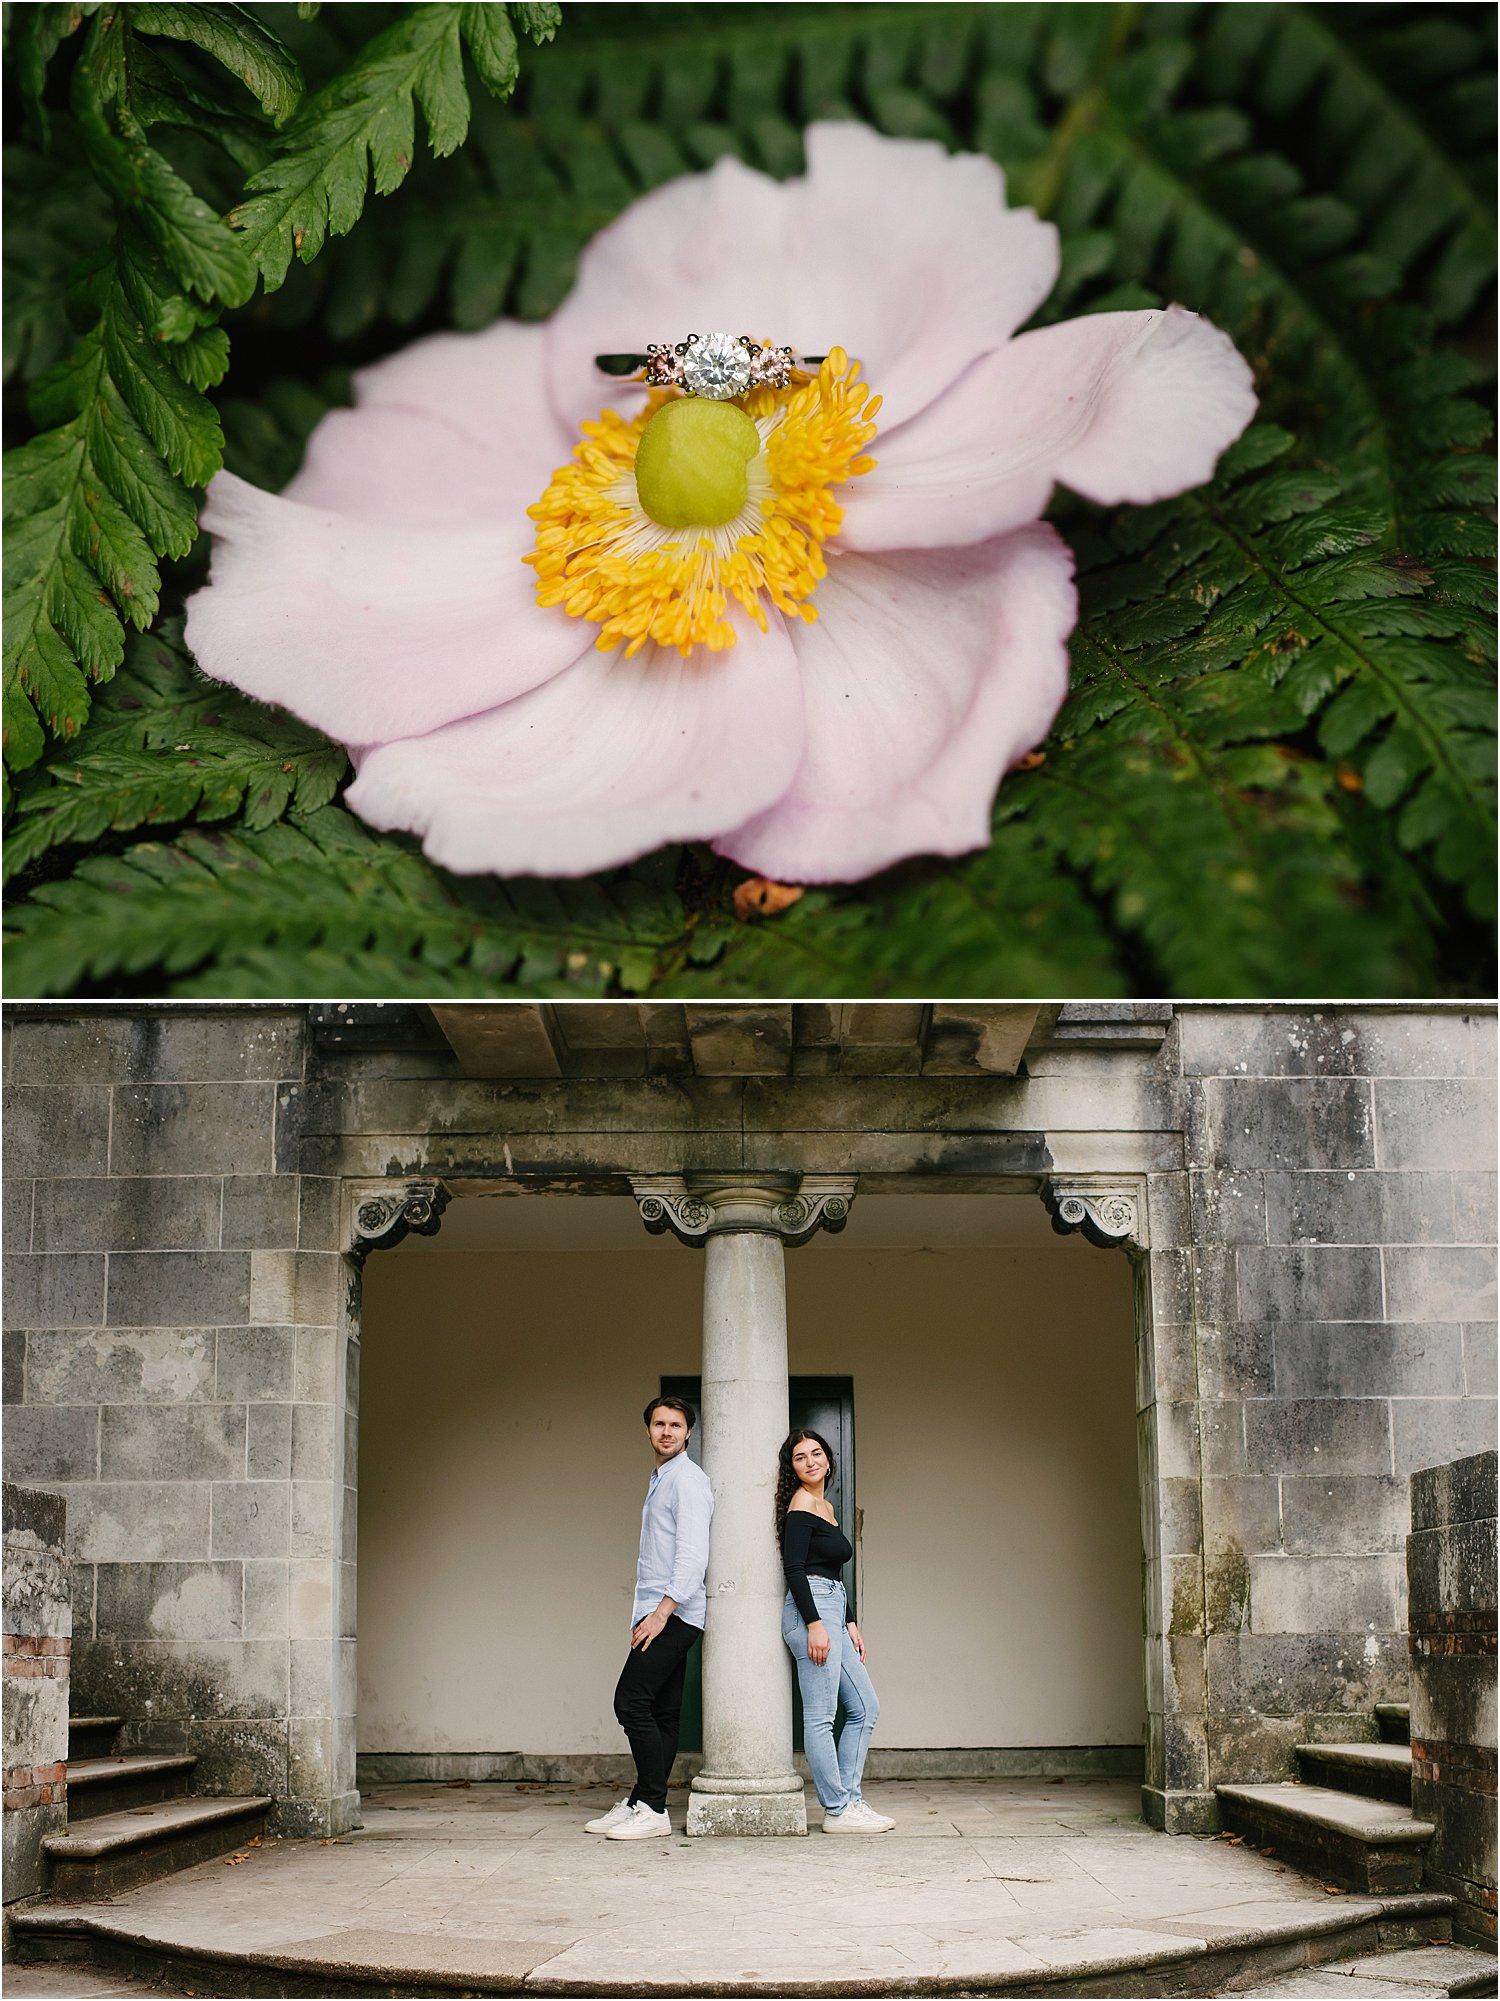 hill-garden-pergola-engagement-photoshoot-hannah-elliott-north-london-lily-sawyer-photography